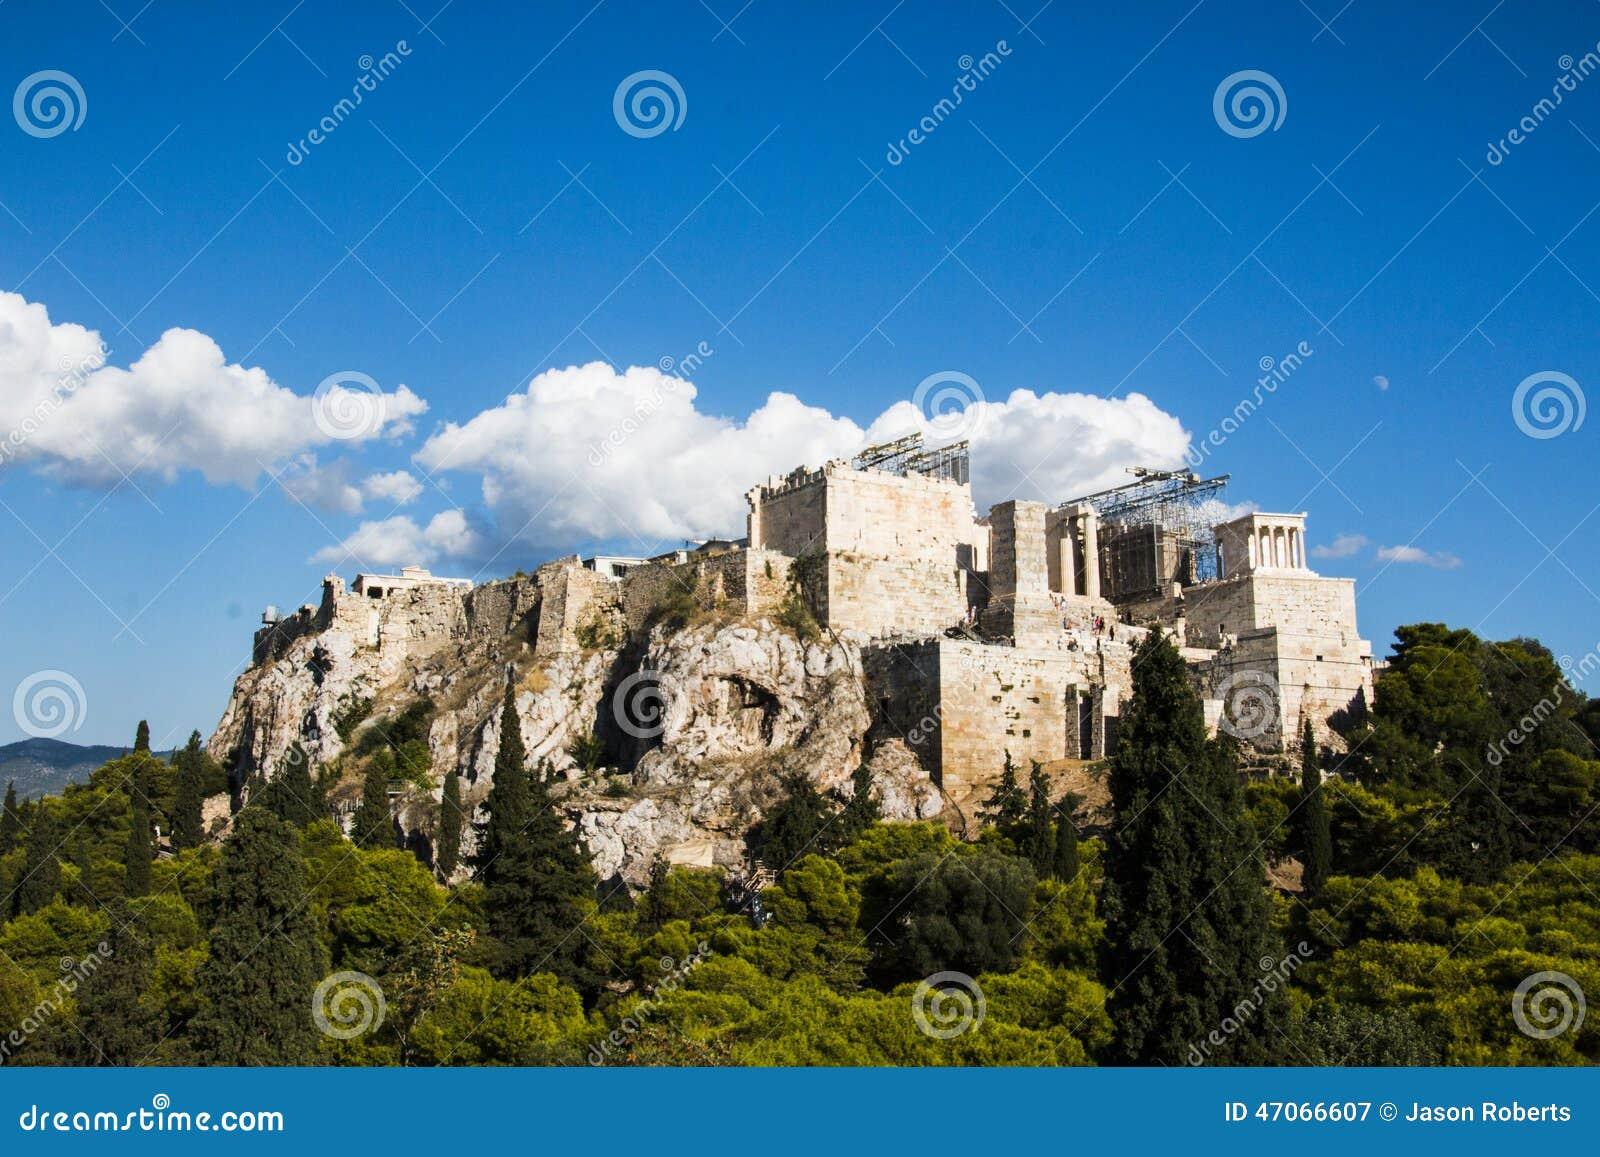 The Parthenon in Athens Greece